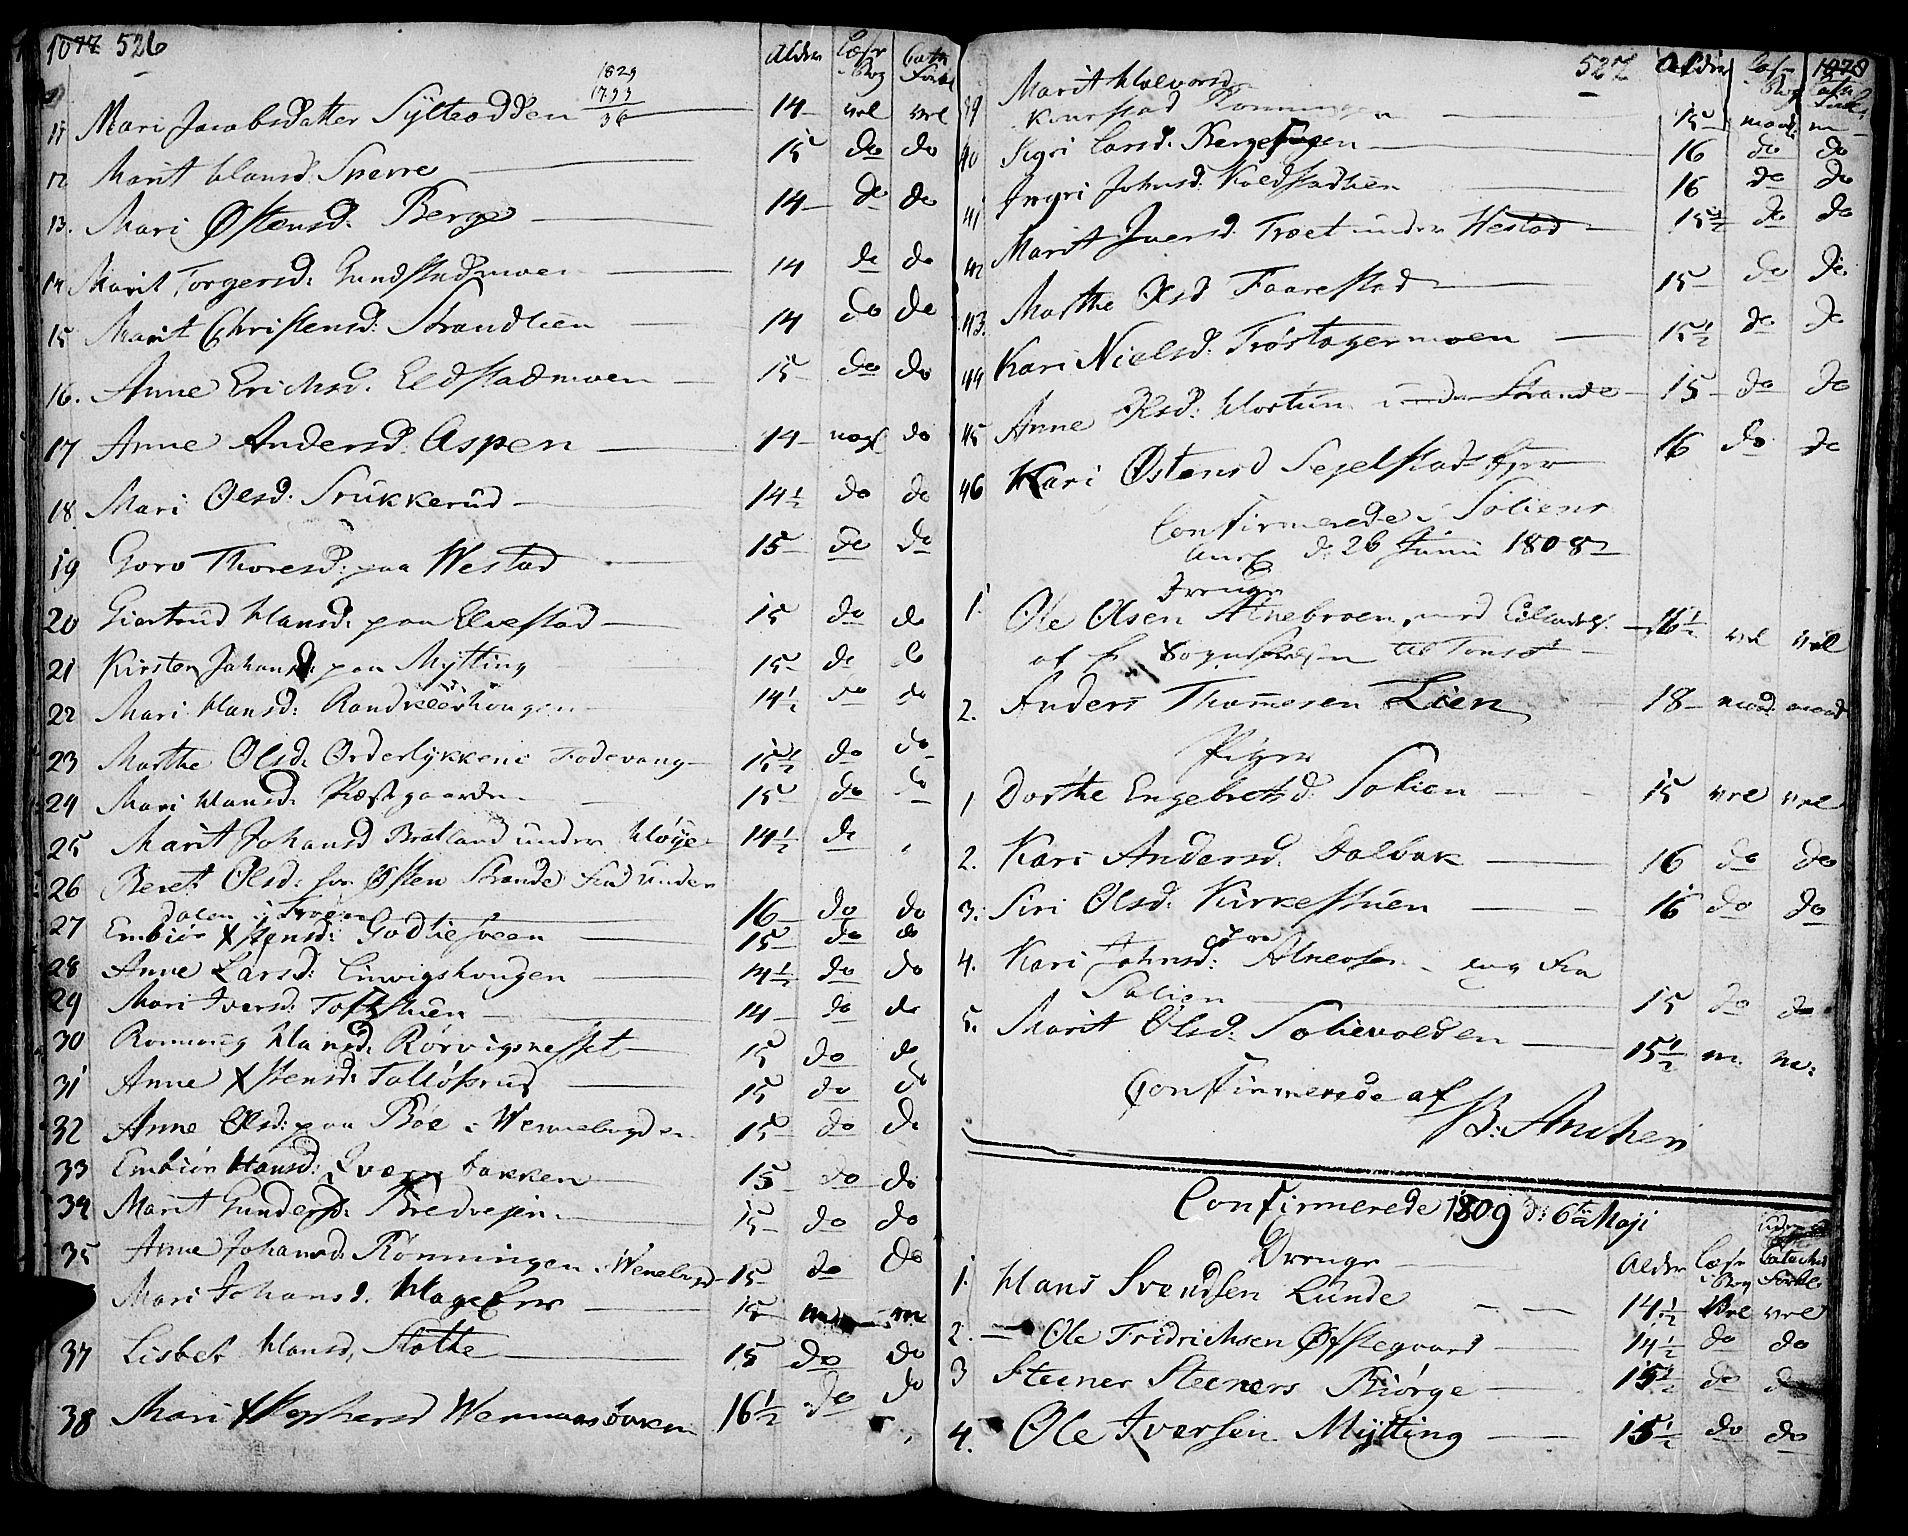 SAH, Ringebu prestekontor, Ministerialbok nr. 3, 1781-1820, s. 526-527